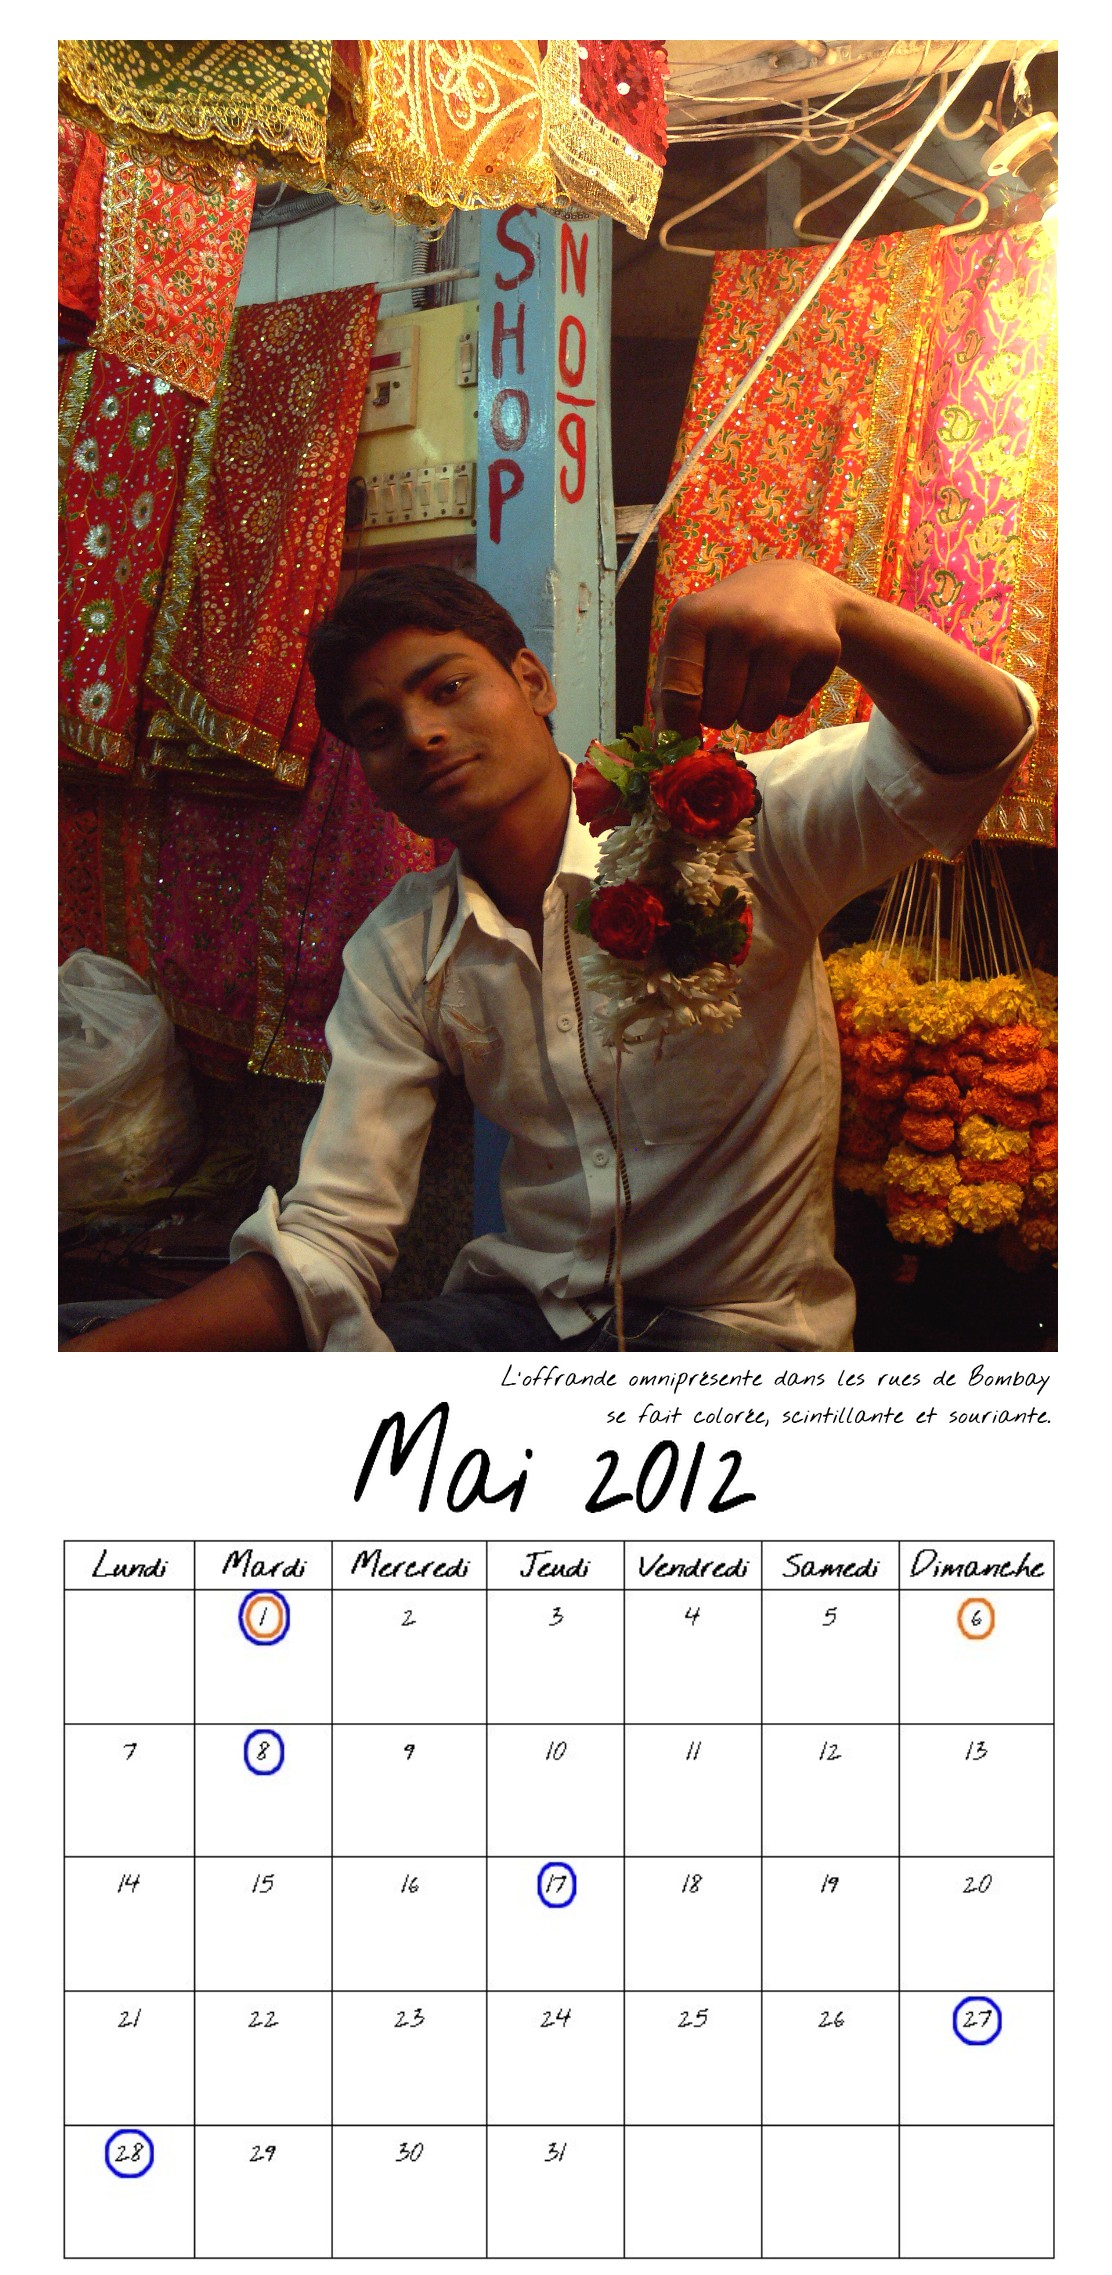 Calendrier de Bombay Mai entier